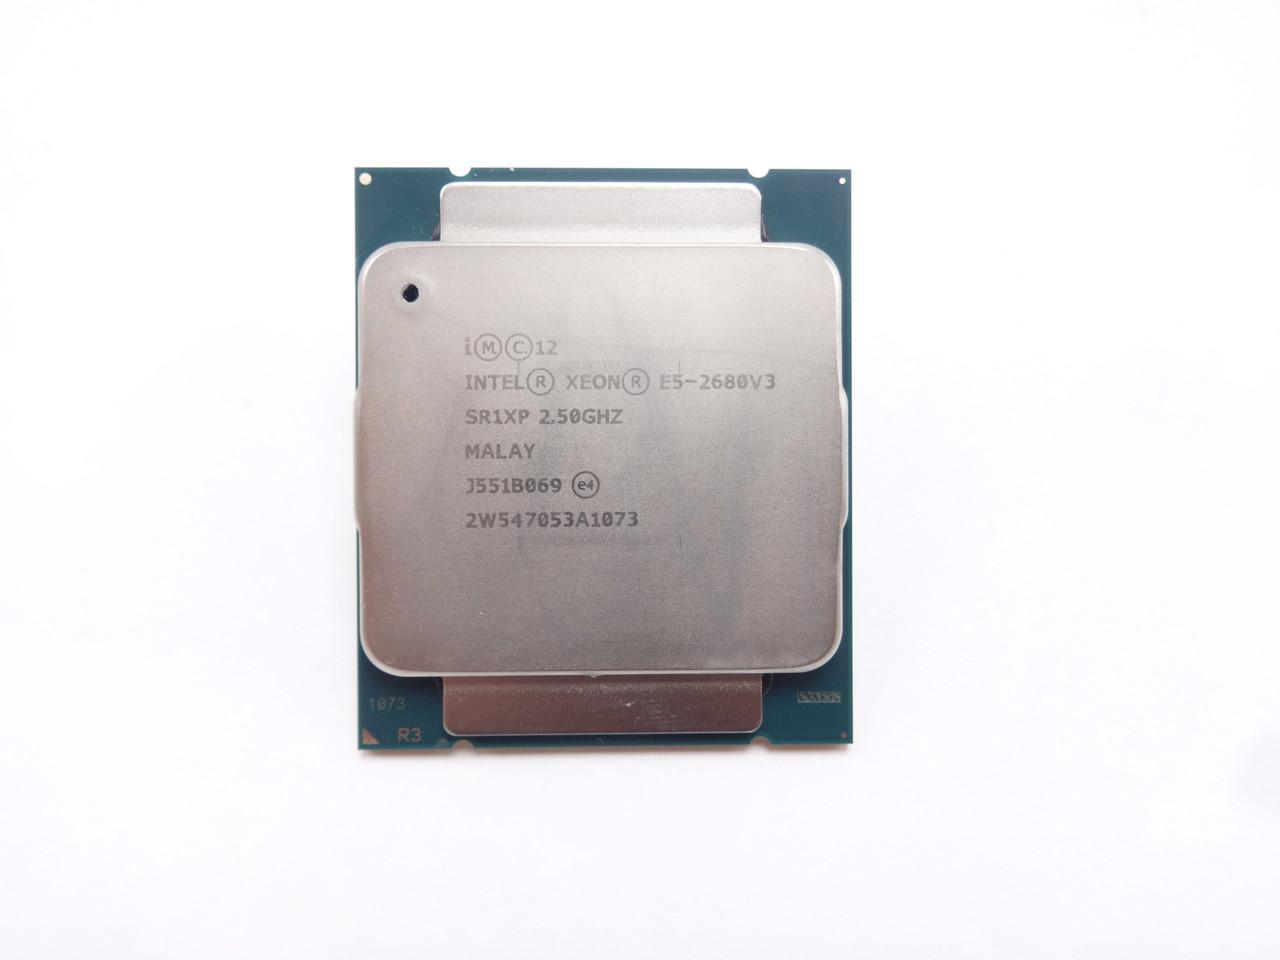 Intel SR1XP E5-2680 V3 12Core 2.53GHz/30MB Processor